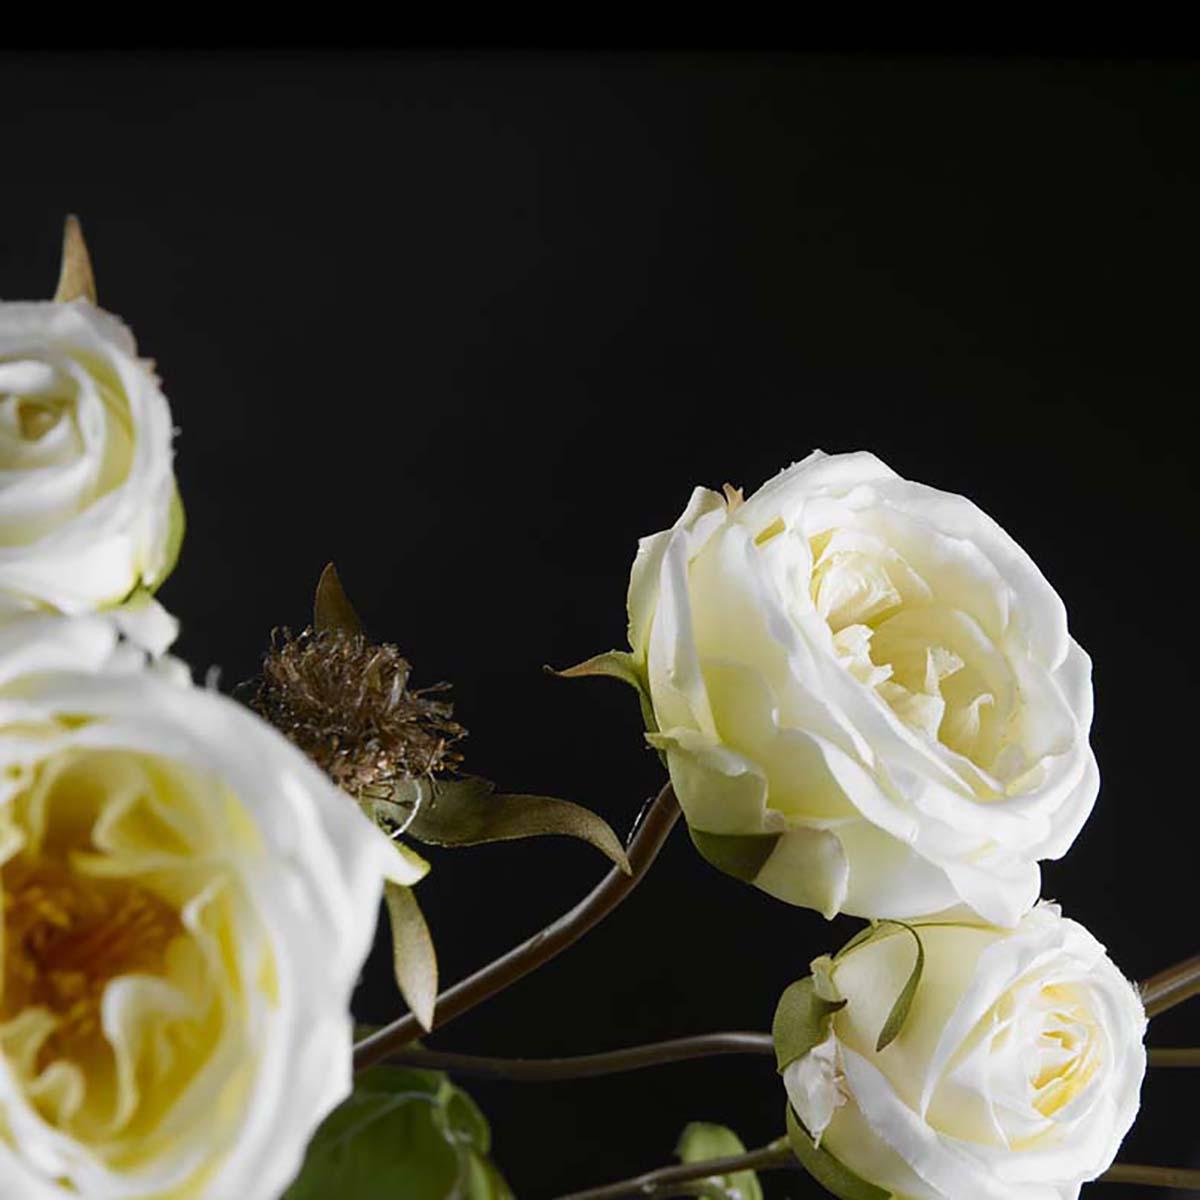 Faux flowers detail by VG New Trend - Masha Shapiro Agency.jpg